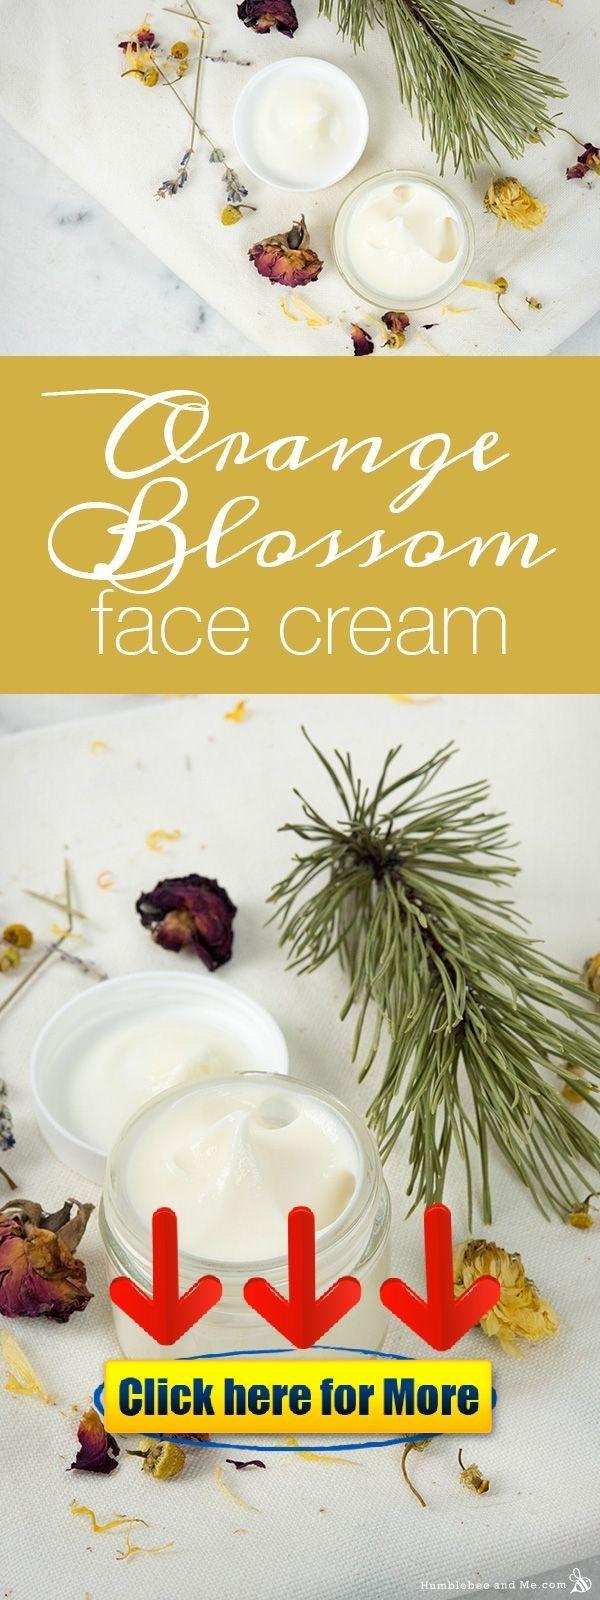 How to Make Orange Blossom Face Cream ? #skincare #skin #antiaging Now tha